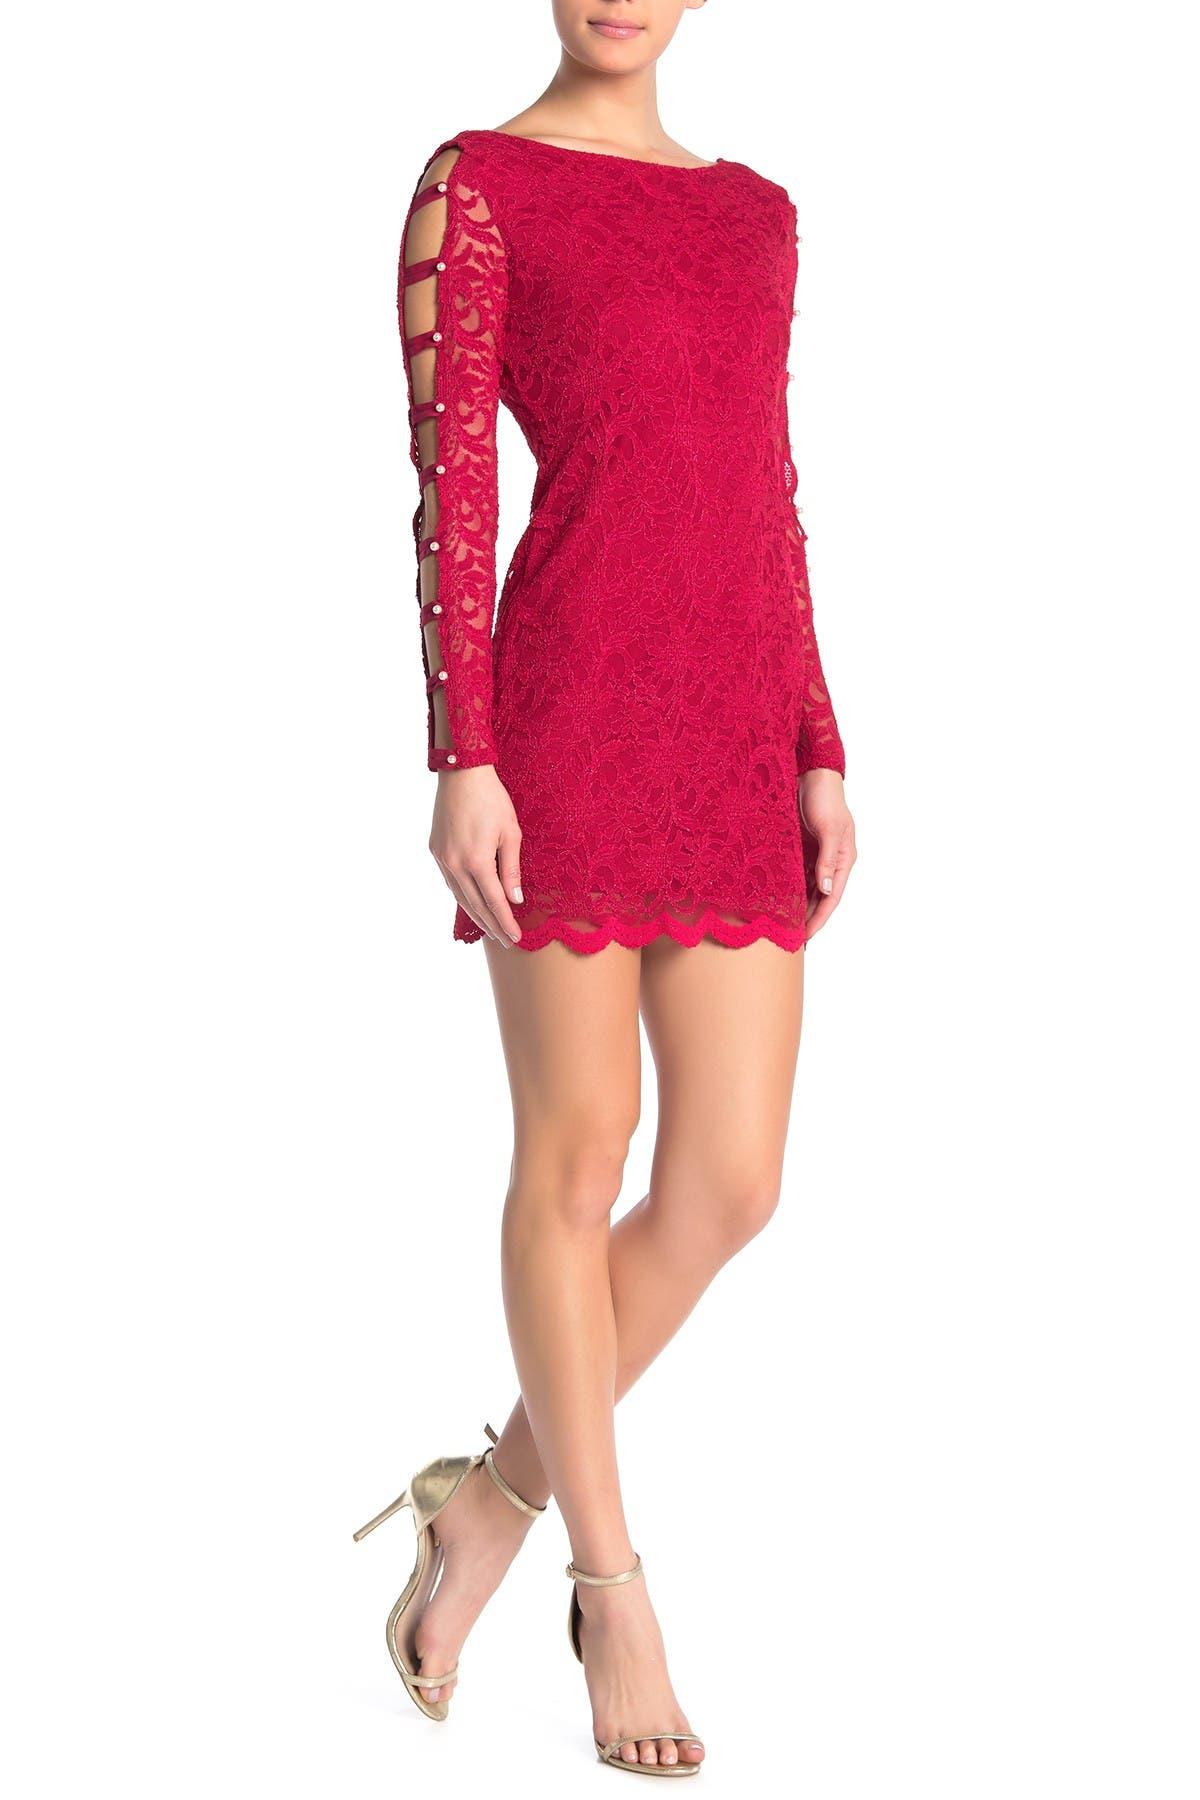 Image of JUMP Caged Sleeve Lace Mini Dress